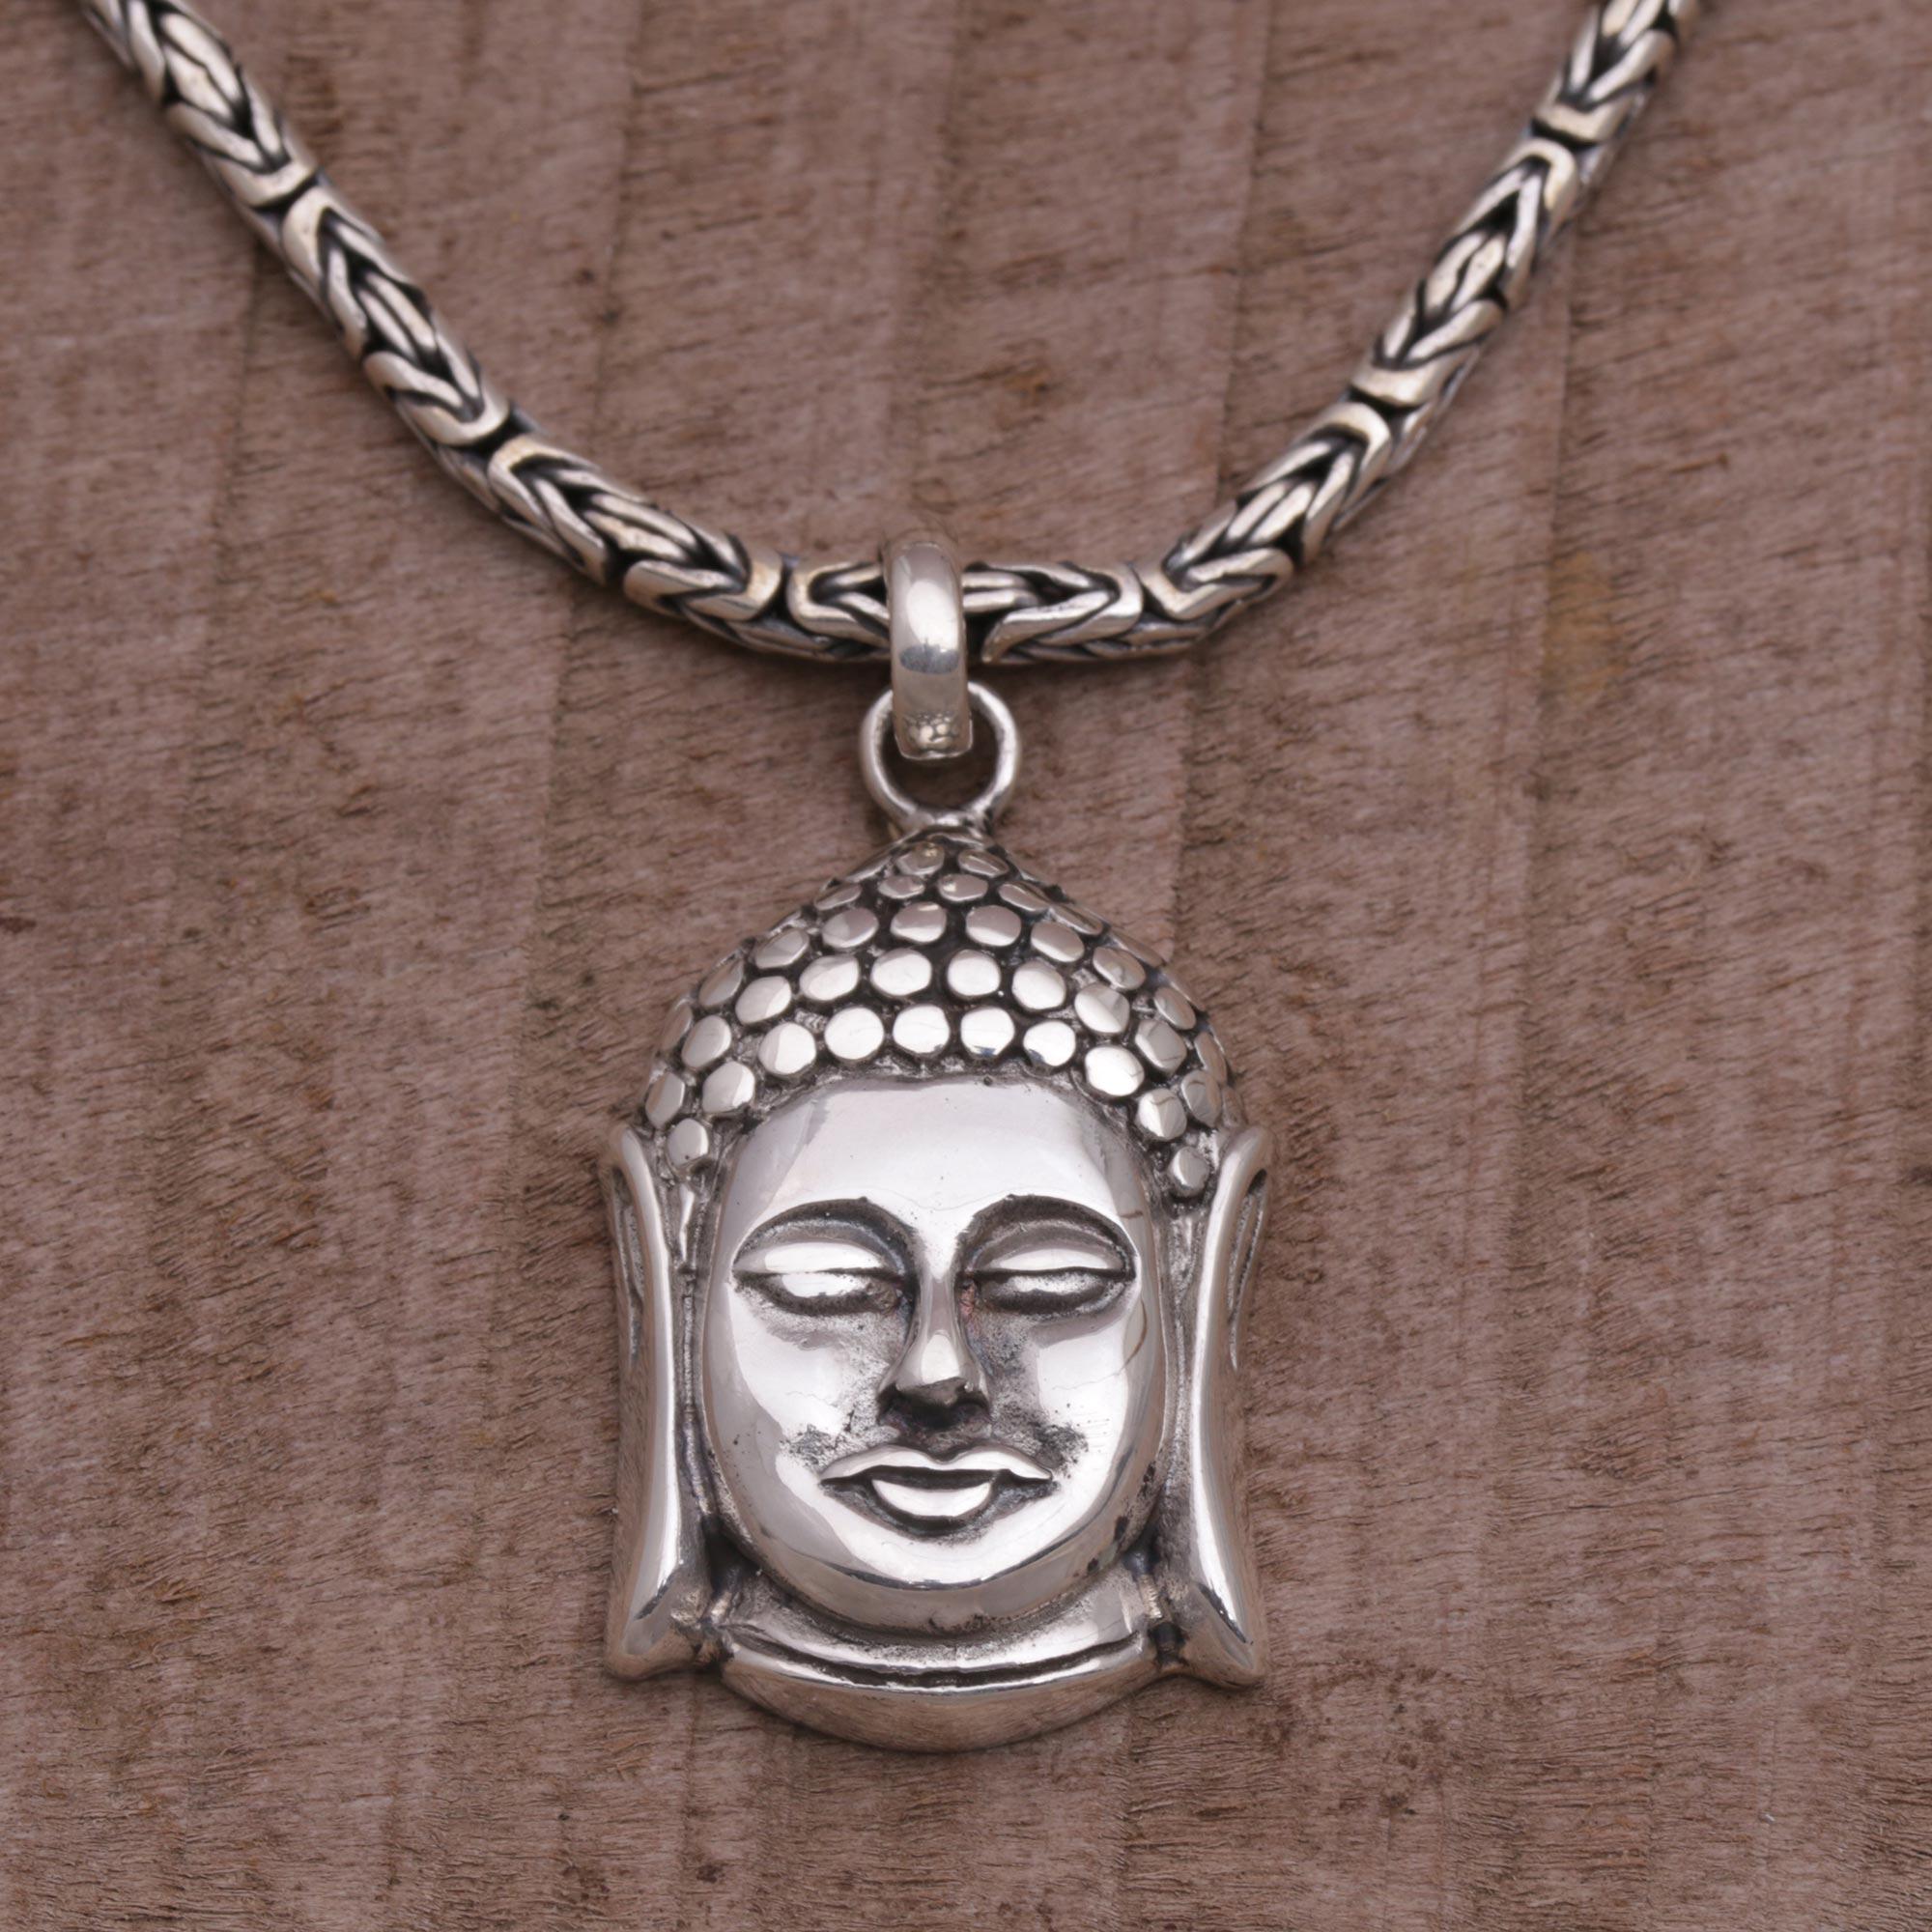 Gt hurleyburley man gt sterling silver men s snake chain bracelet - Sterling Silver Pendant Necklace Charm Of Buddha Sterling Silver Buddha Pendant Necklace